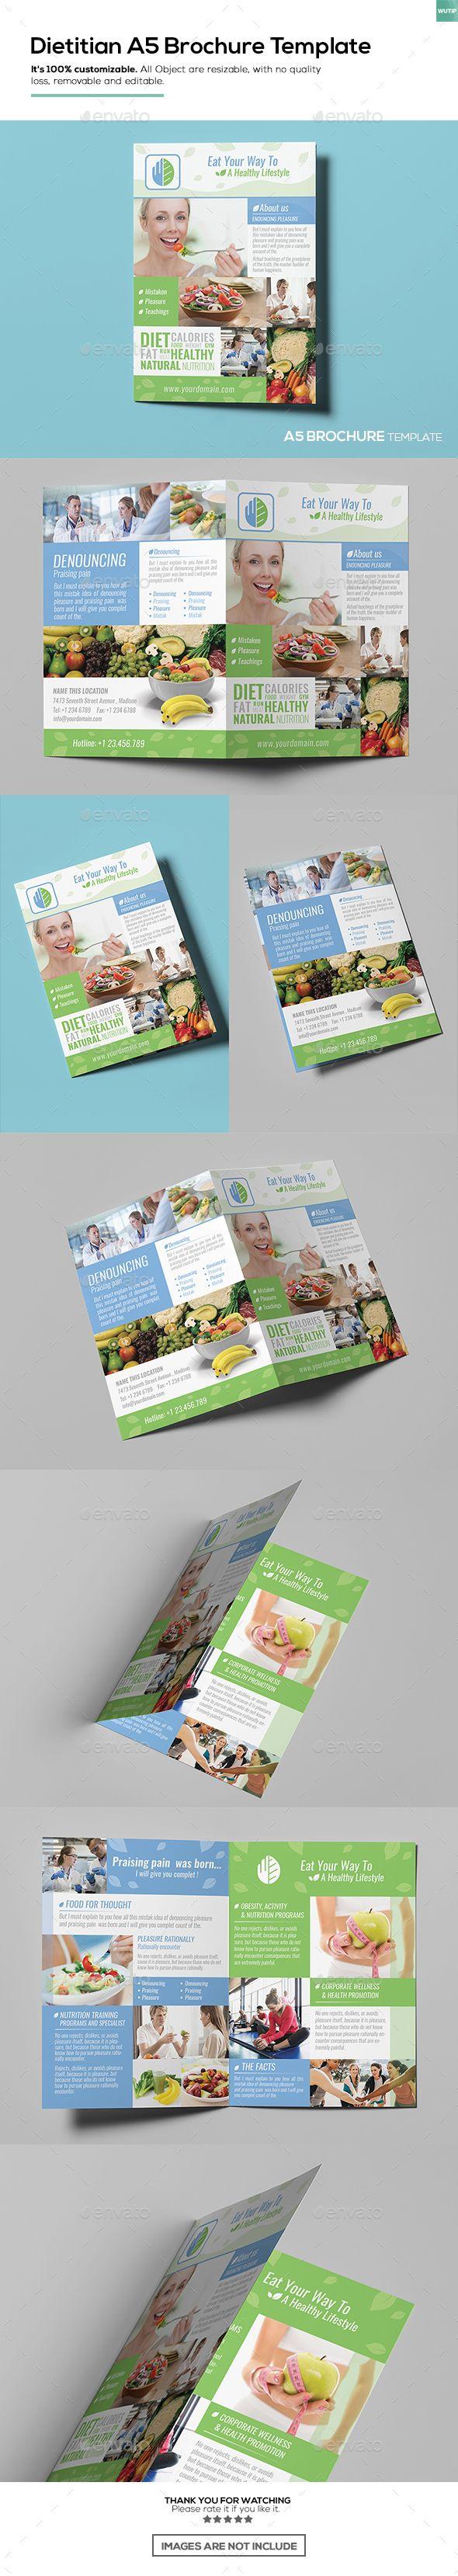 dietitian a5 brochure template